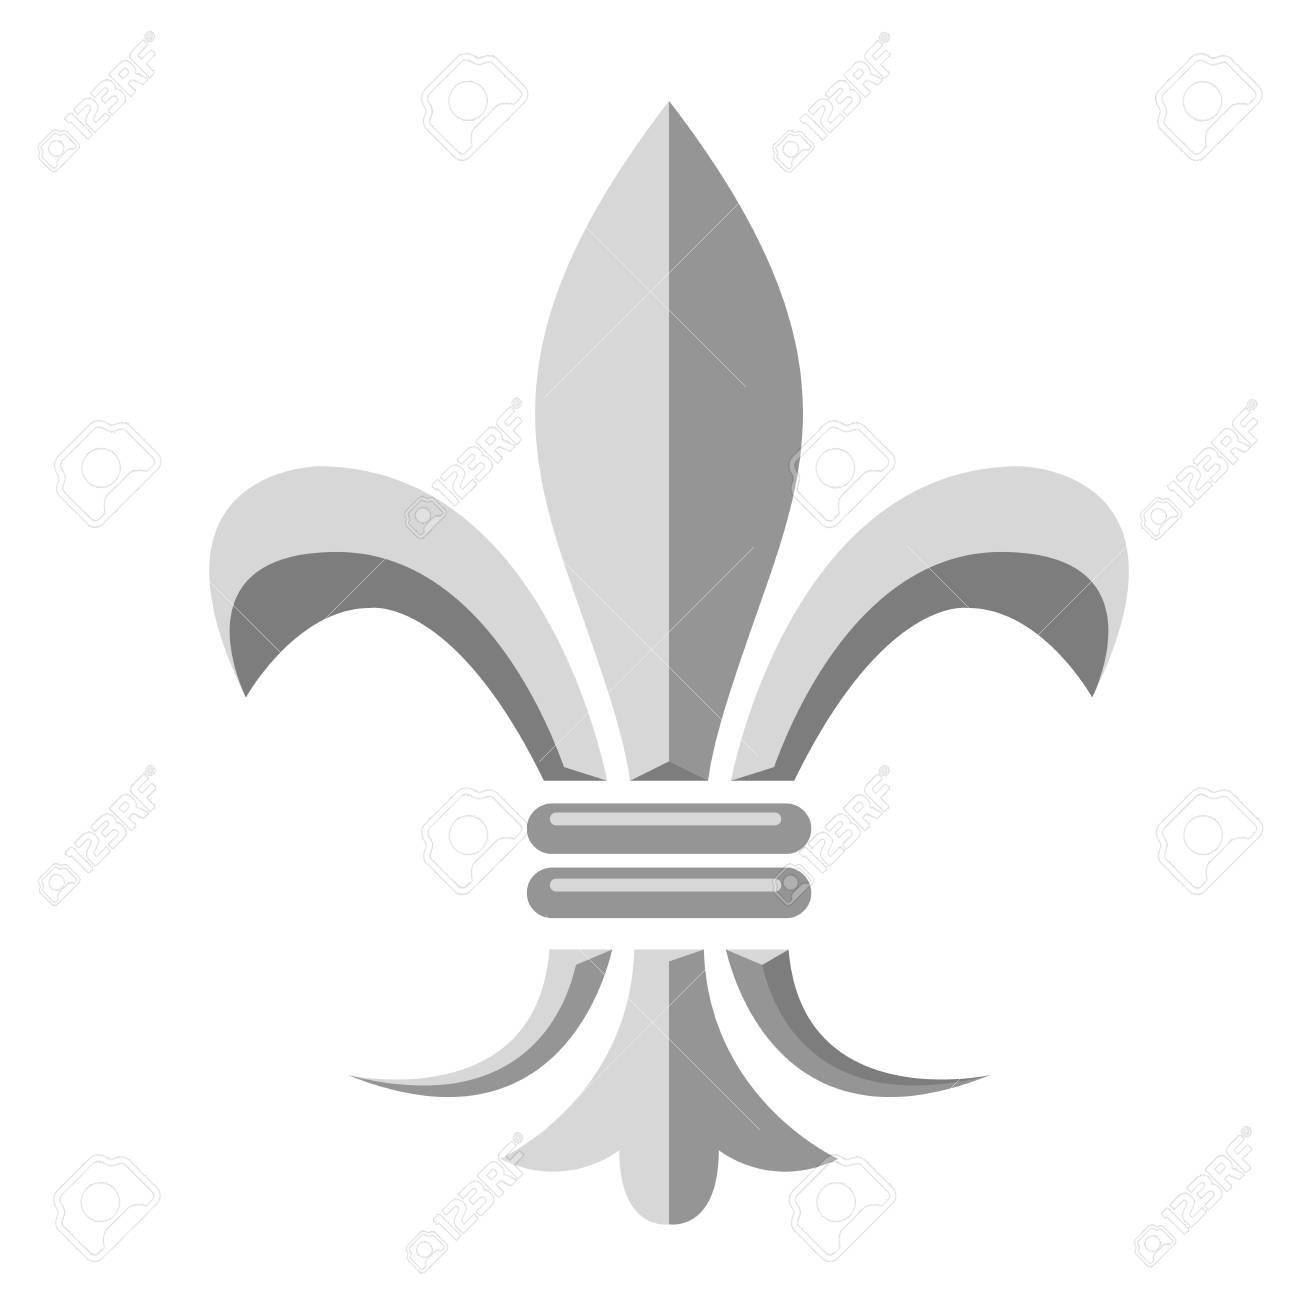 Fleur De Lis Heraldic Symbol Of French Royal Monarchy Royalty Free